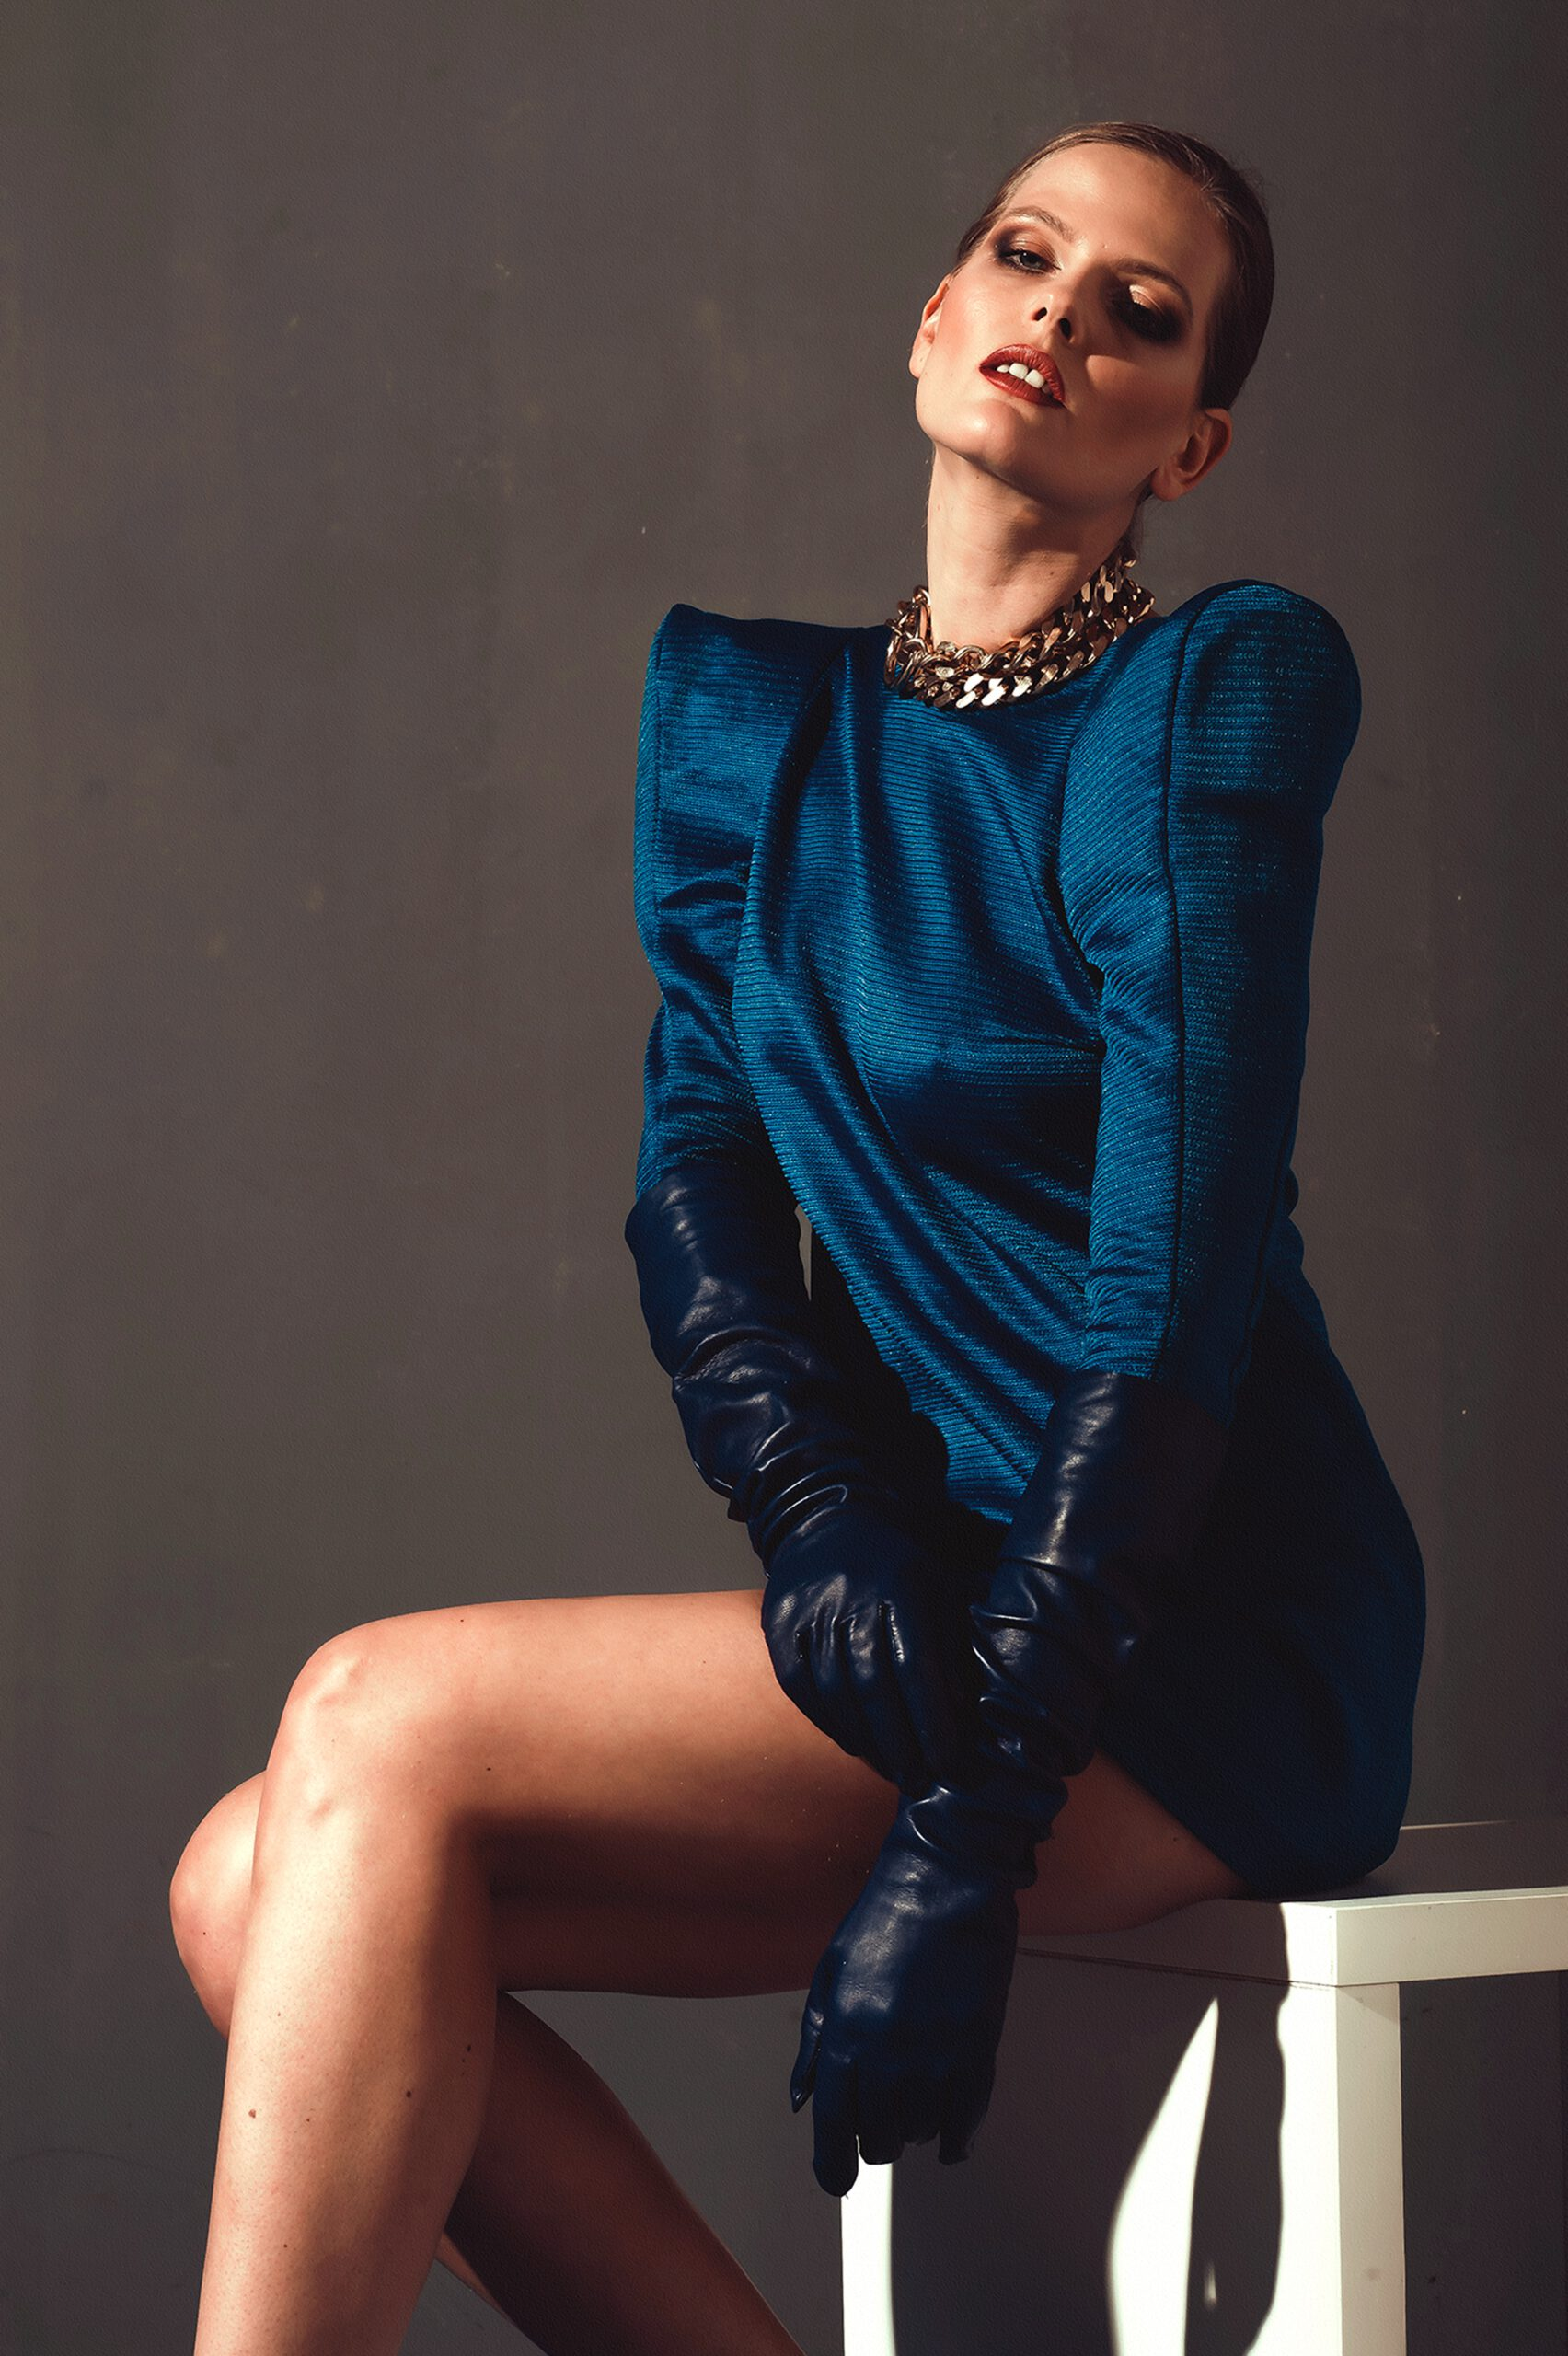 fashion girl scaled - Testosterone stress